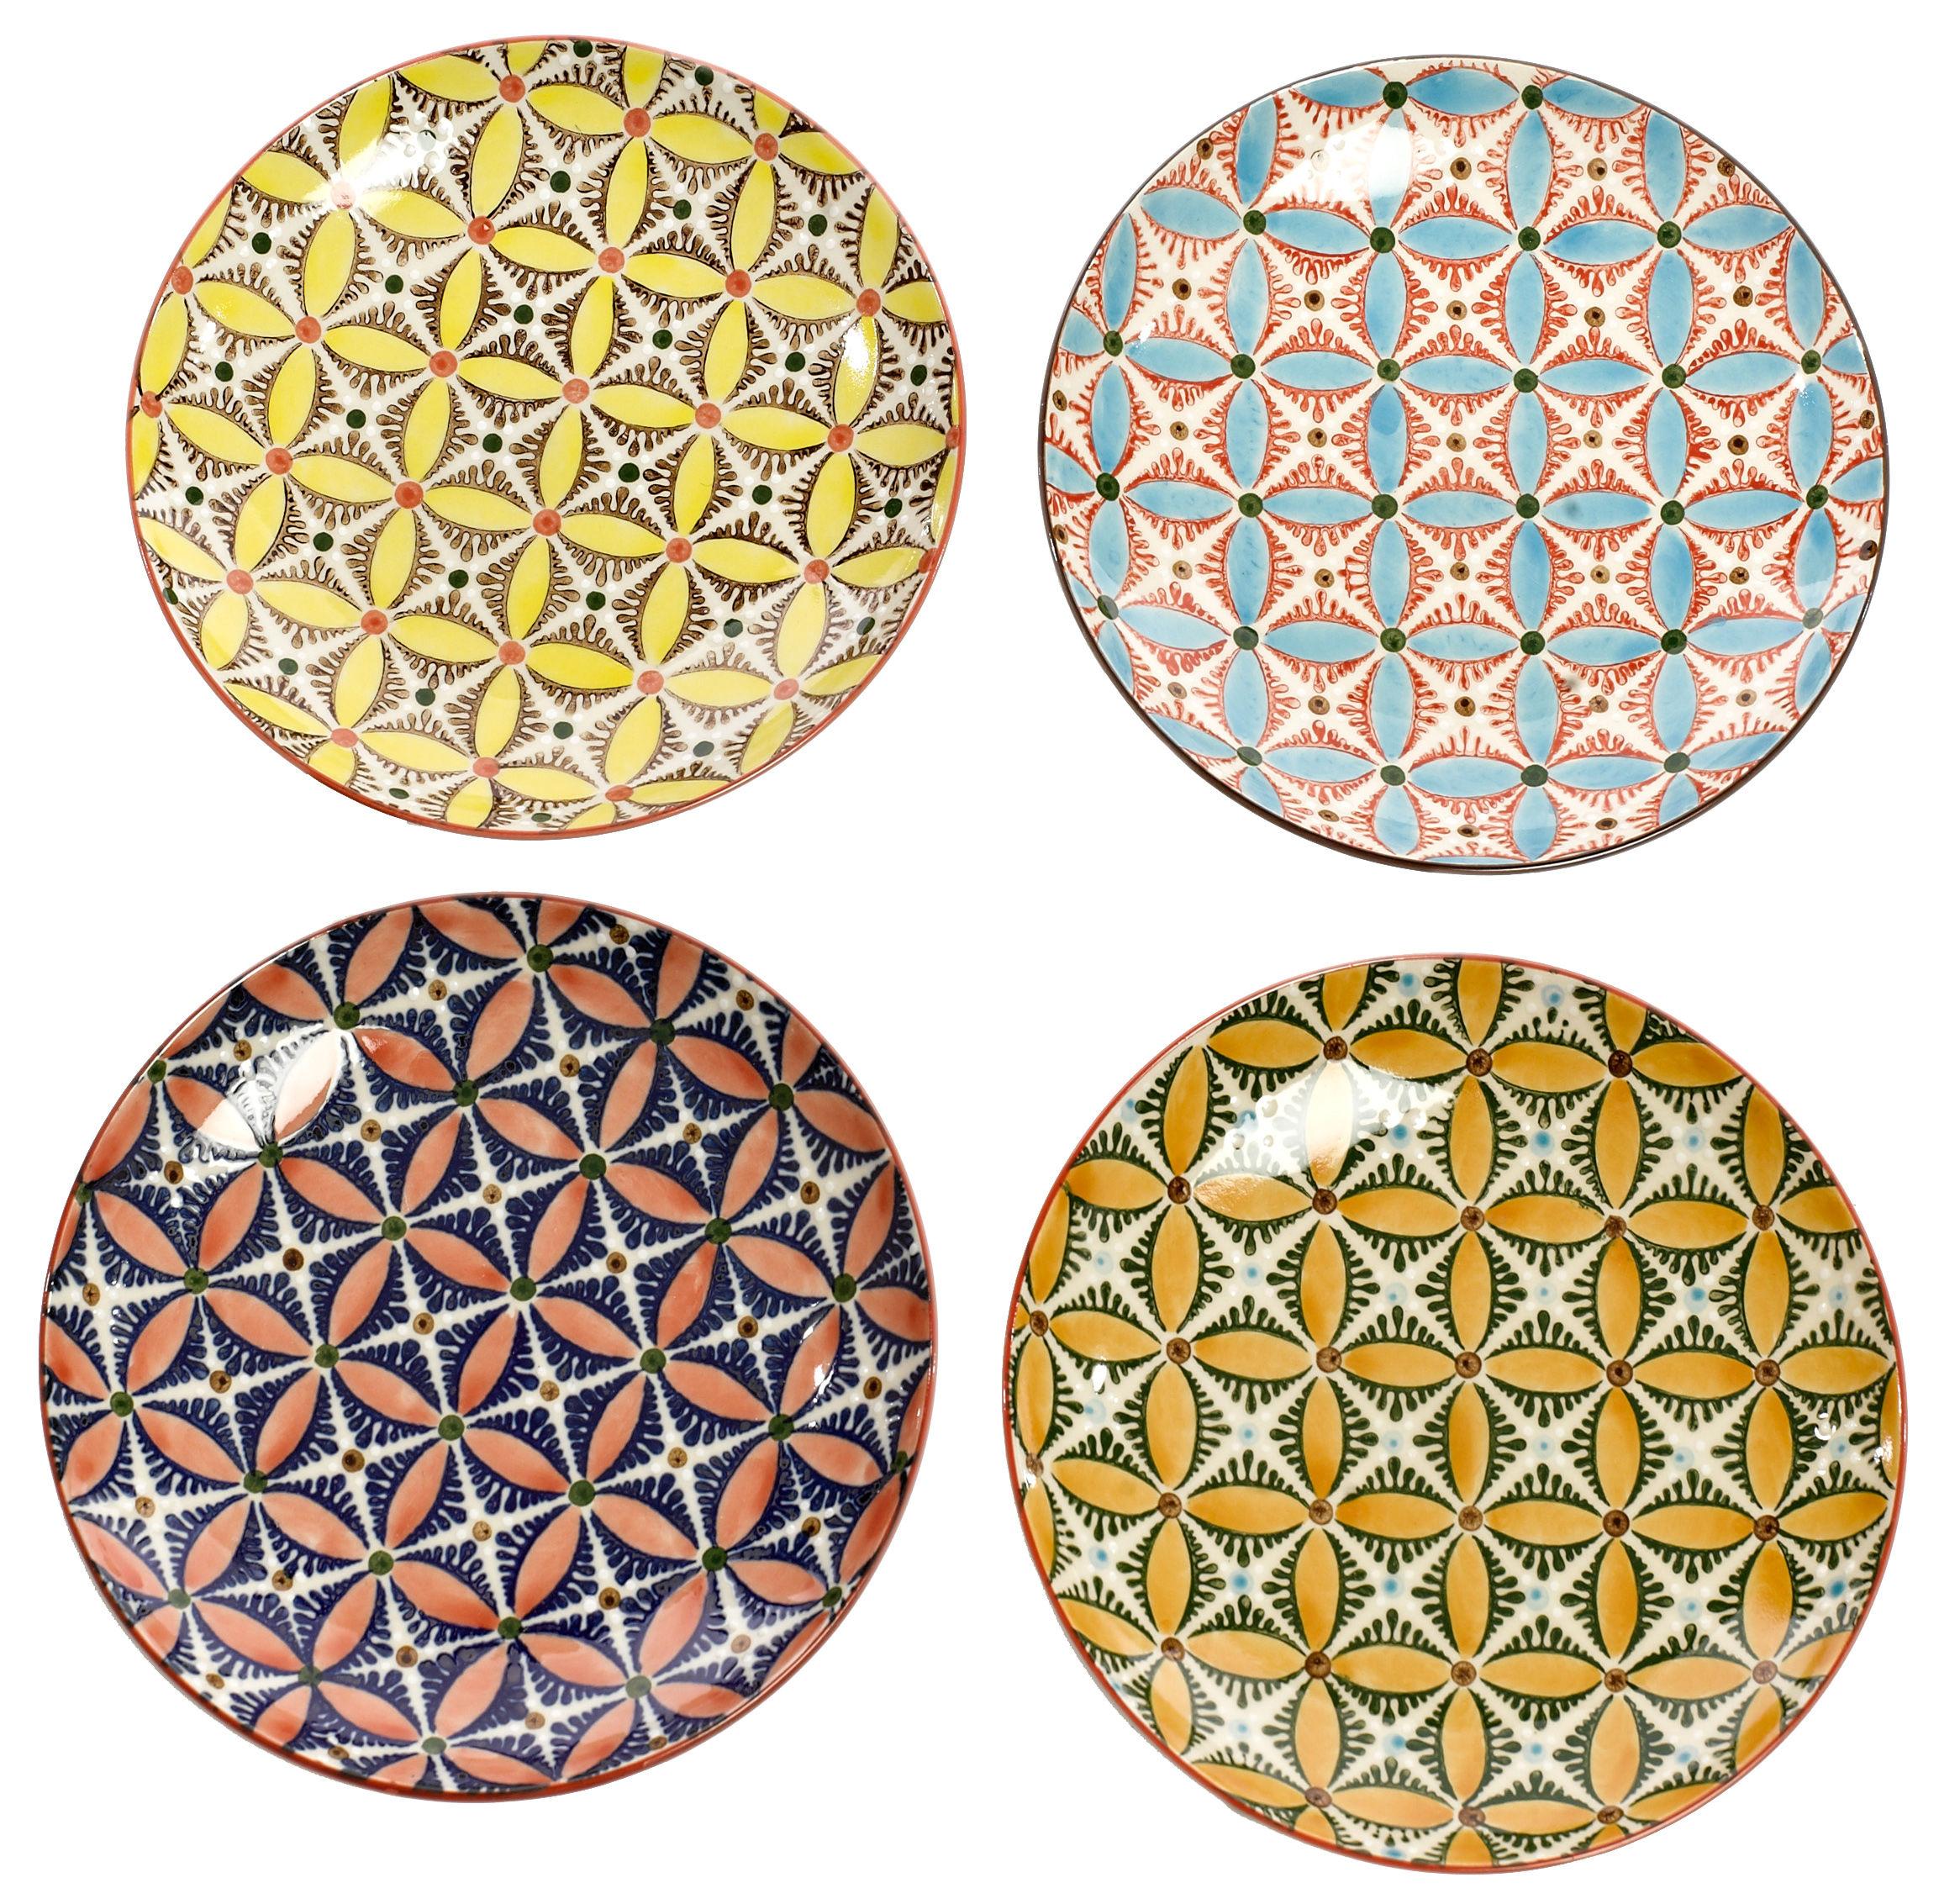 Tischkultur - Teller - Hippy Dessertteller / Ø 20 cm - 4er-Set - Pols Potten - Mehrfarbig - Céramique vitrifiée